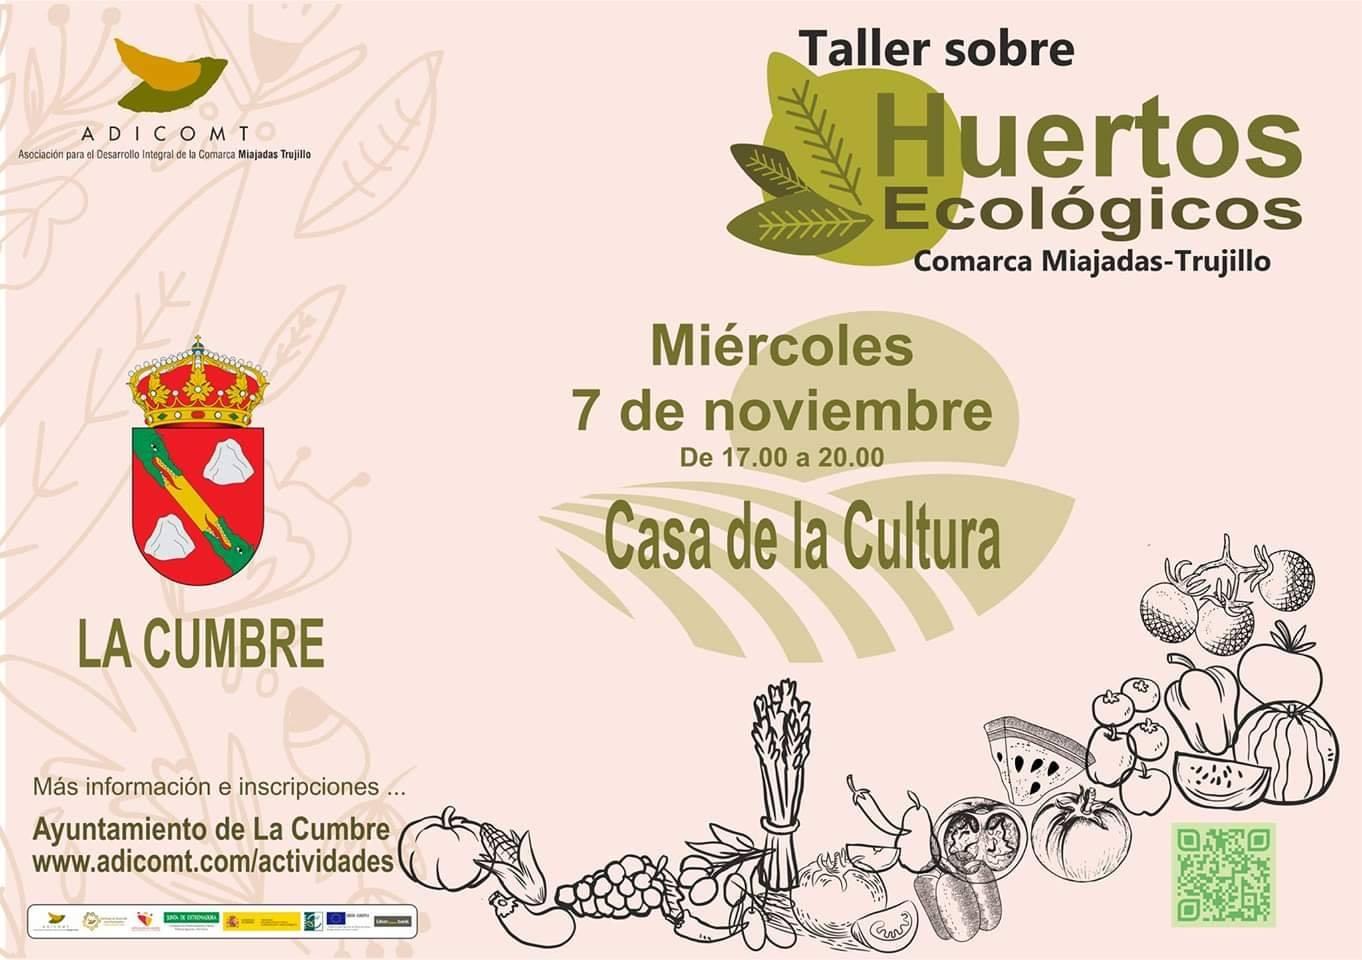 Taller de Huertos ecológicos 2018 - La Cumbre (Cáceres)